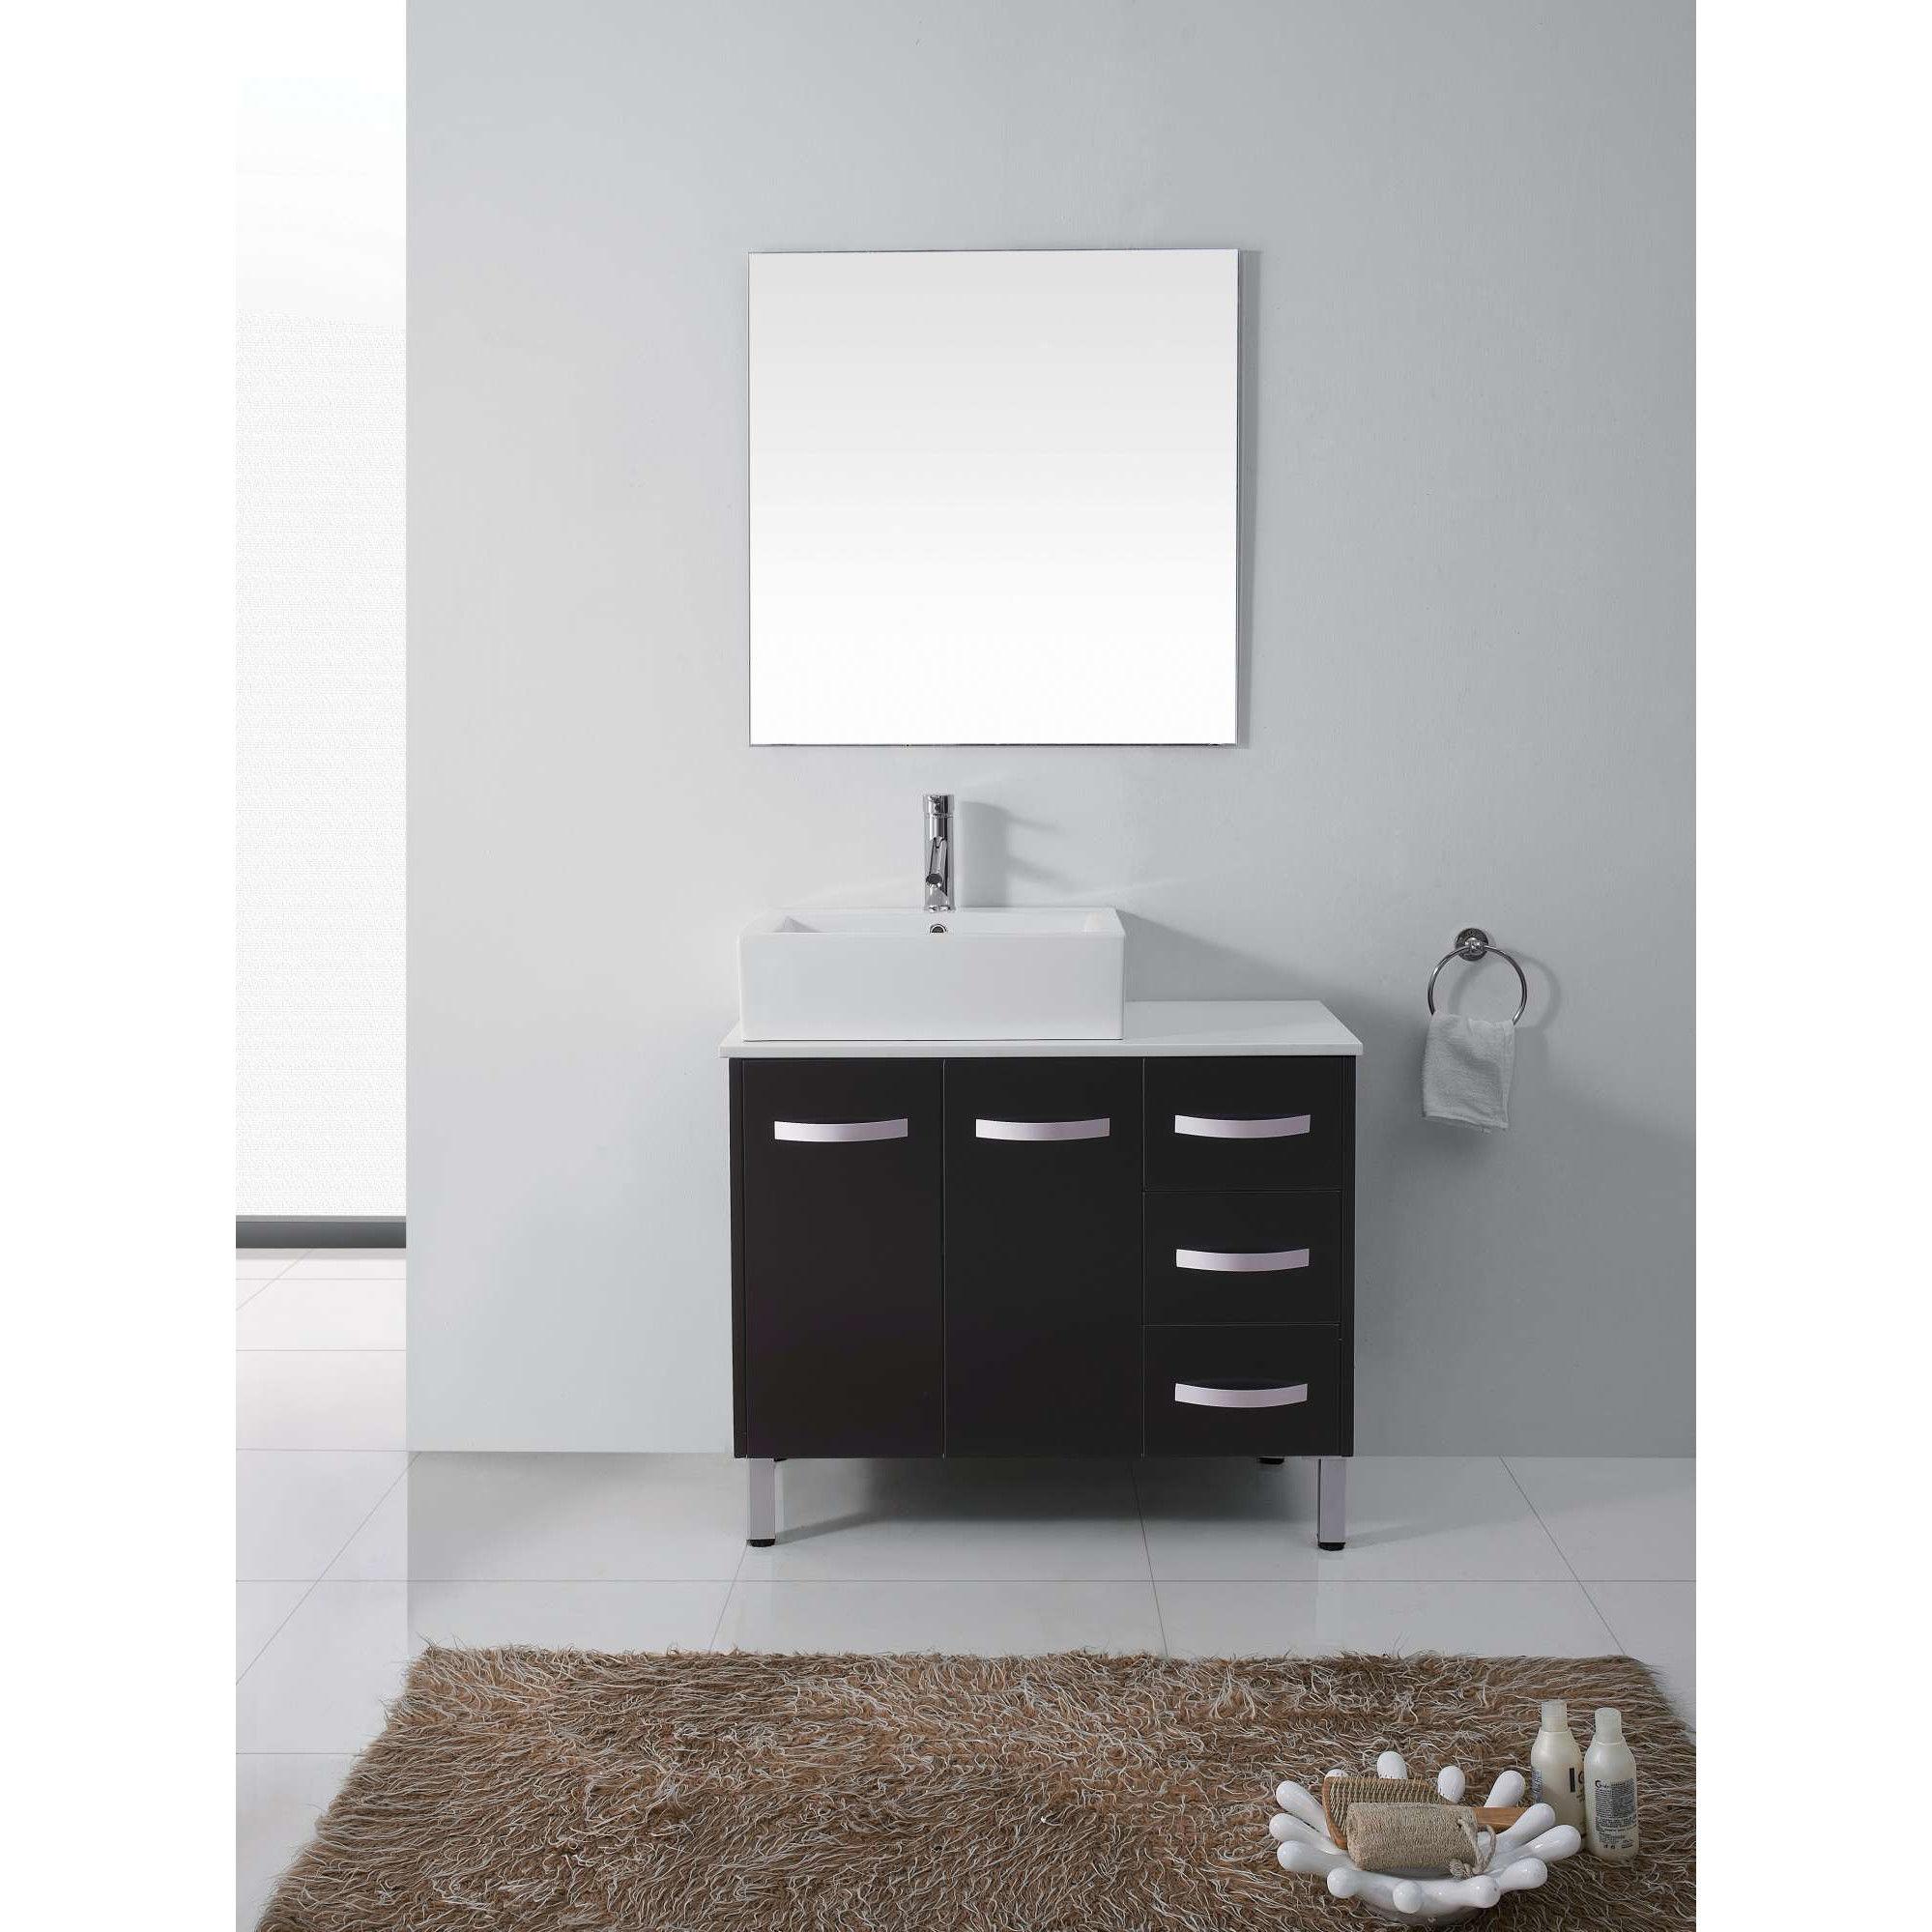 cabinets new for in sale vanities unique bathroom koisaneurope wood of vanity